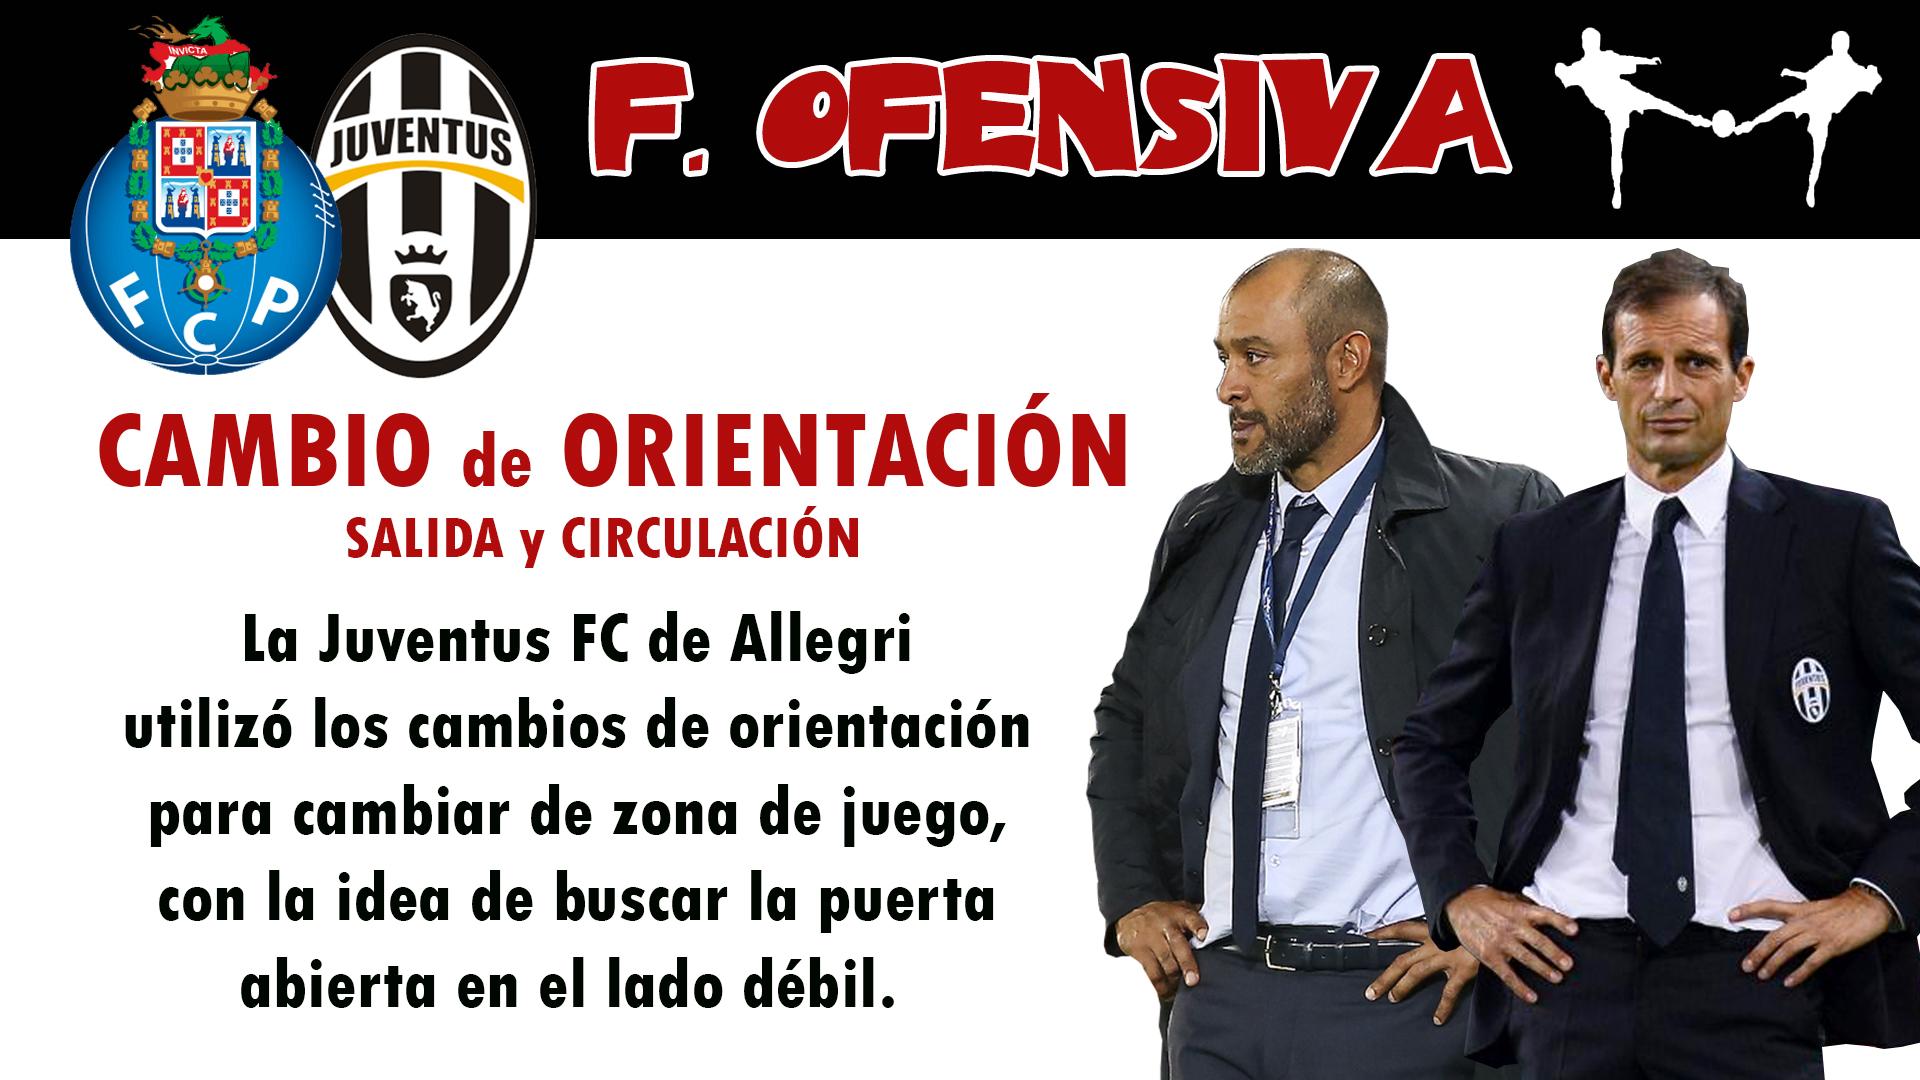 futbolcarrasco juventus oporto champions league maximiliano allegri nuno análisis táctico